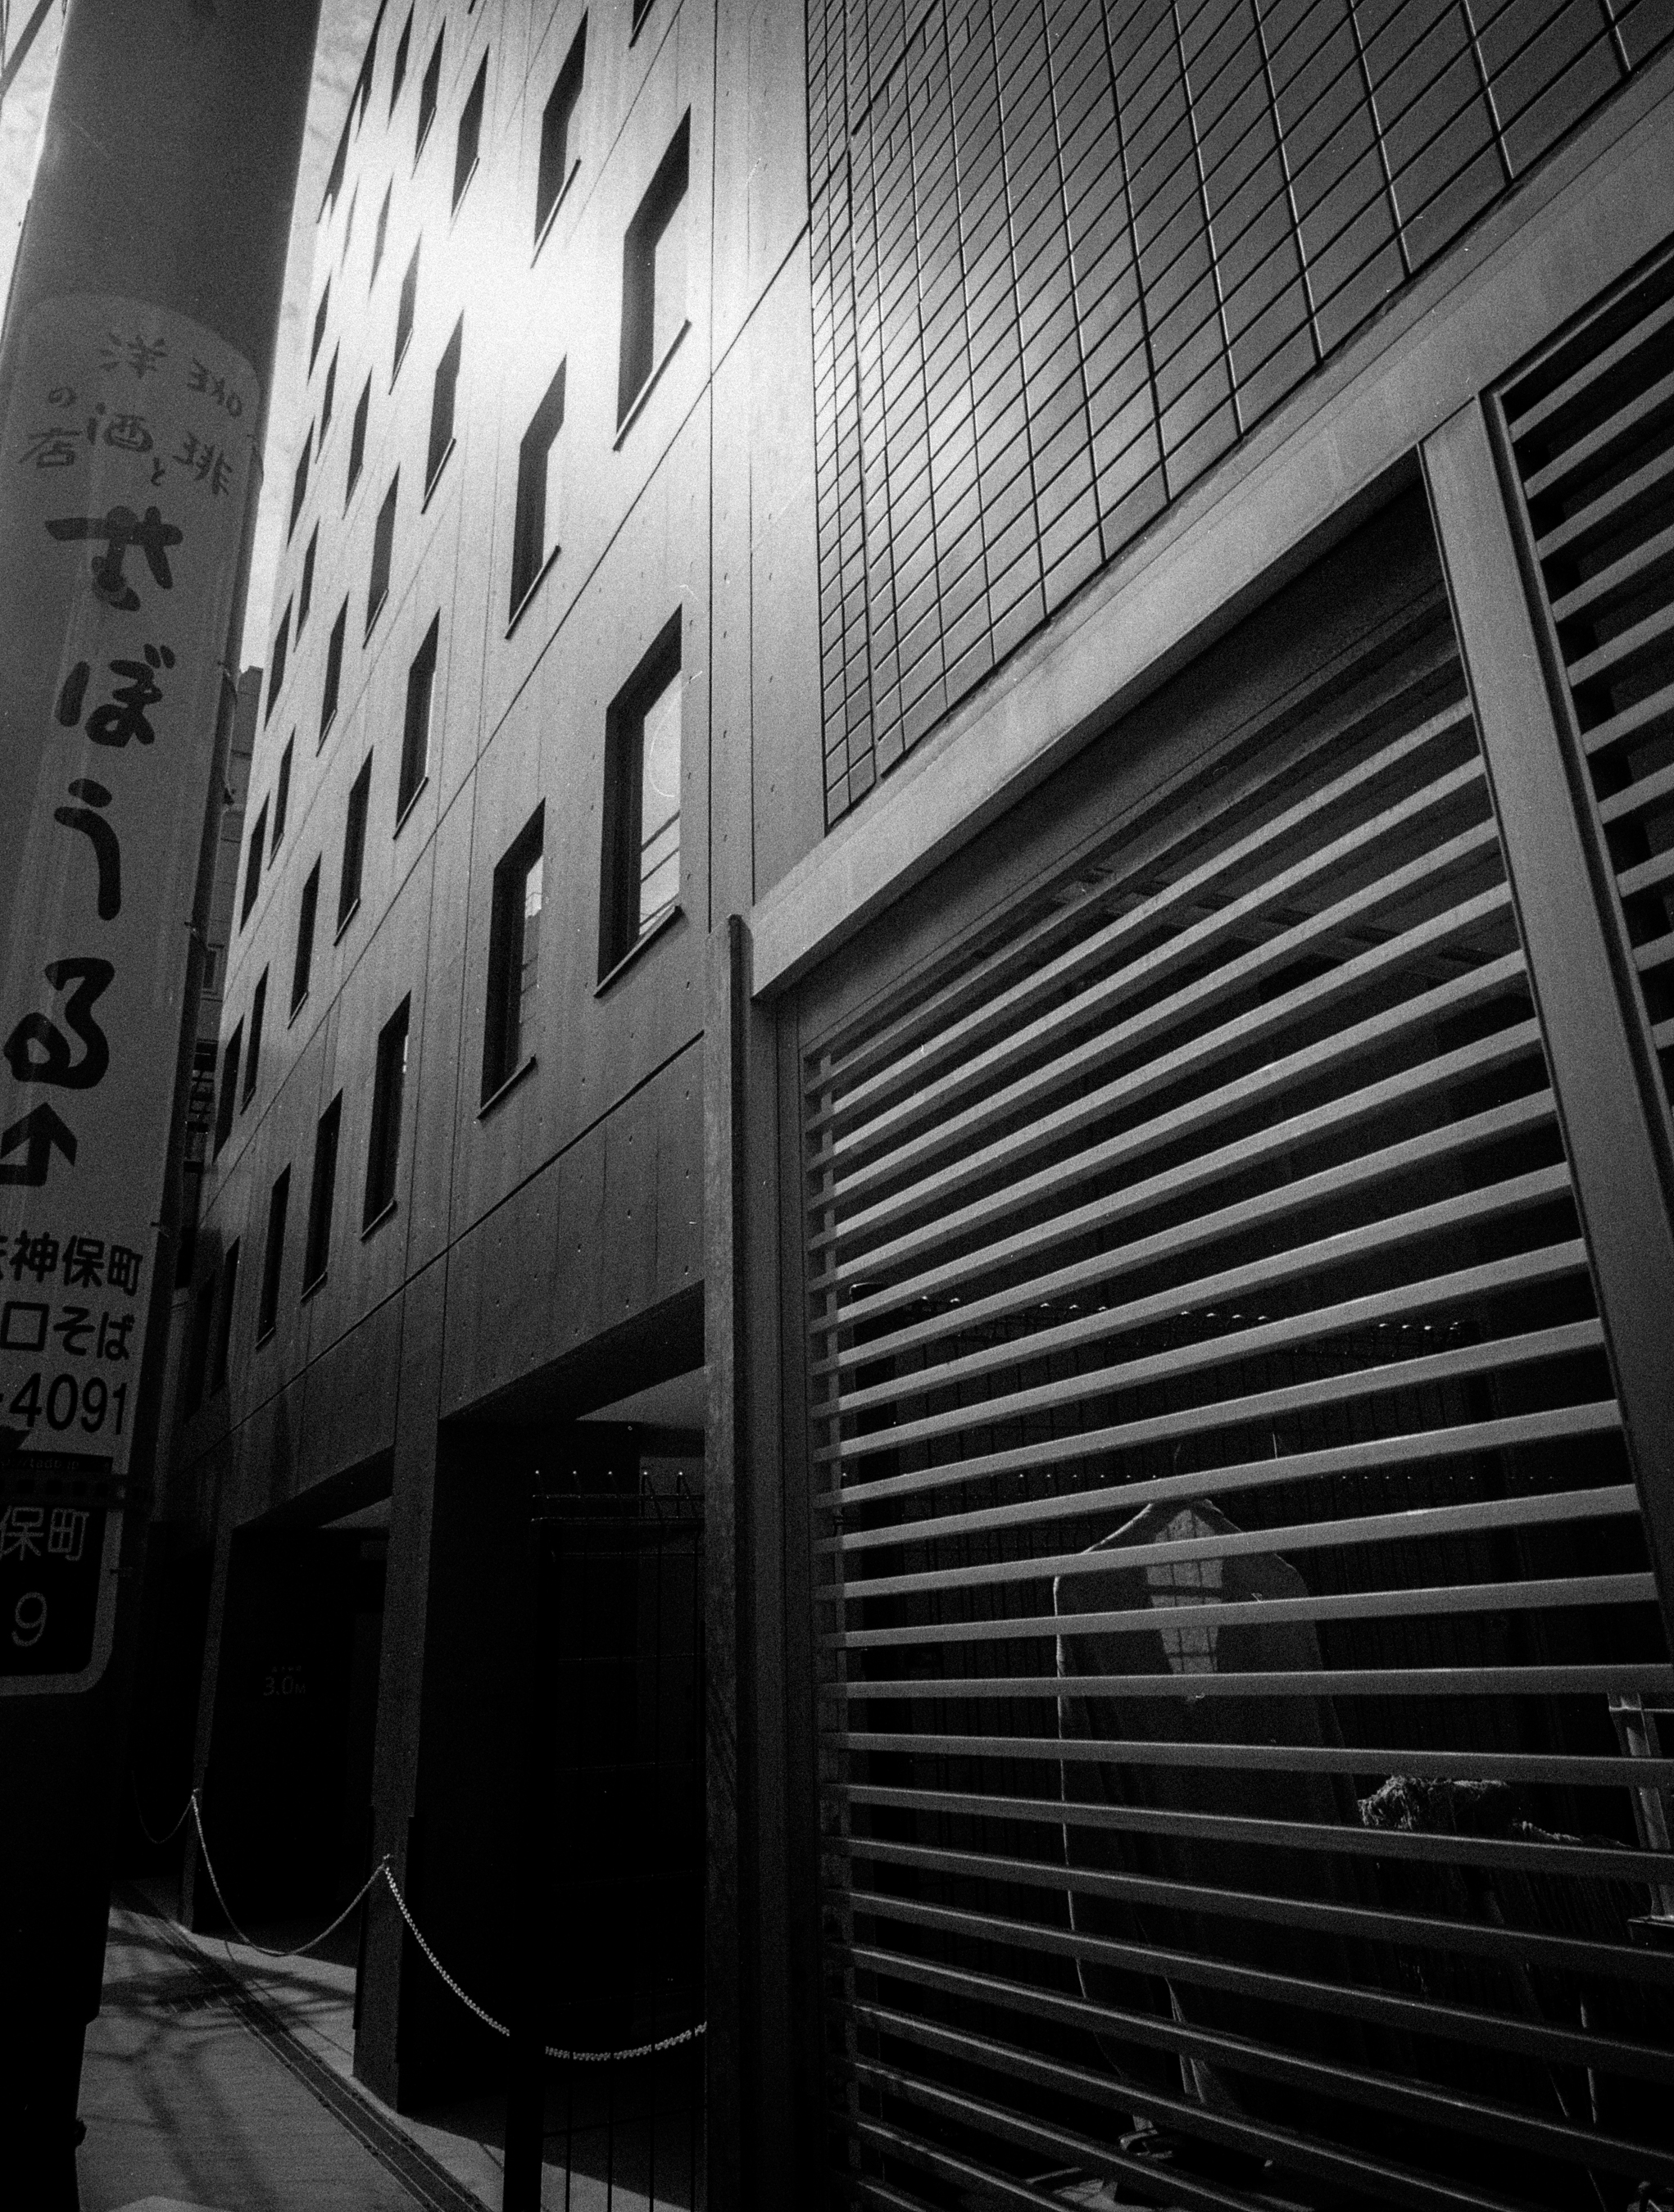 f:id:aoyama-takuro:20180426073651j:plain